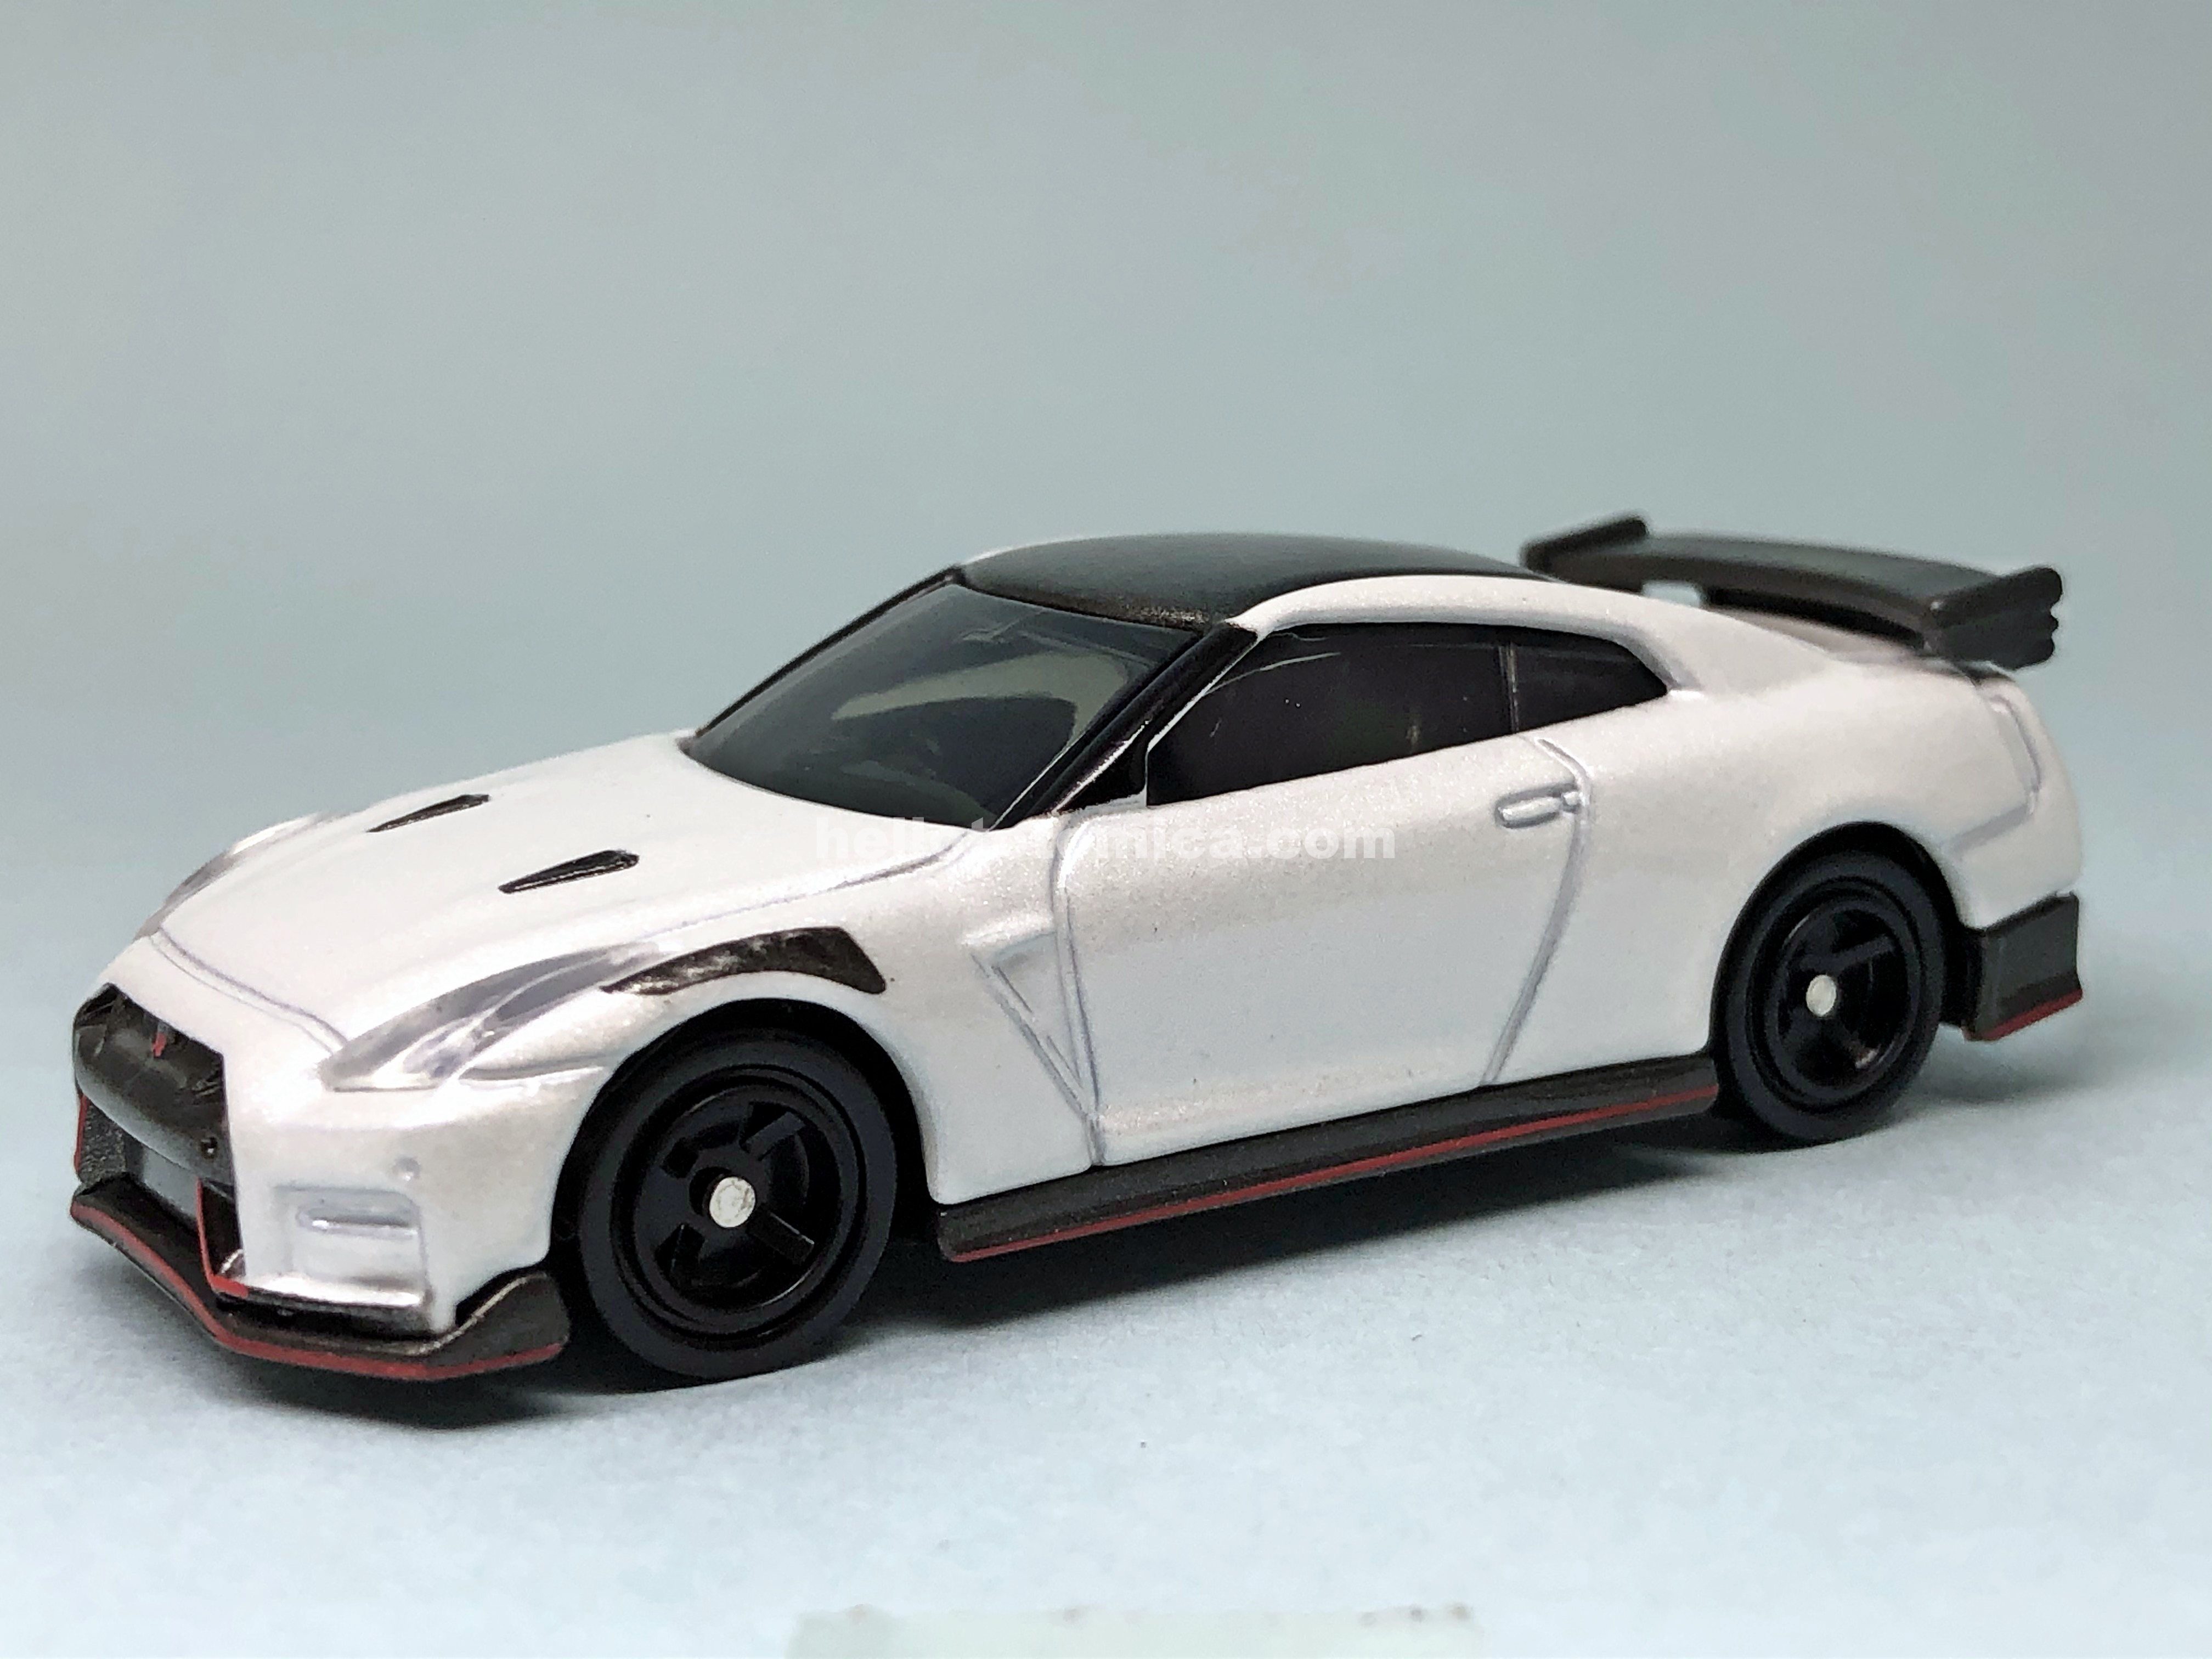 78-11 NISSAN GT-R NISMO 2020 model